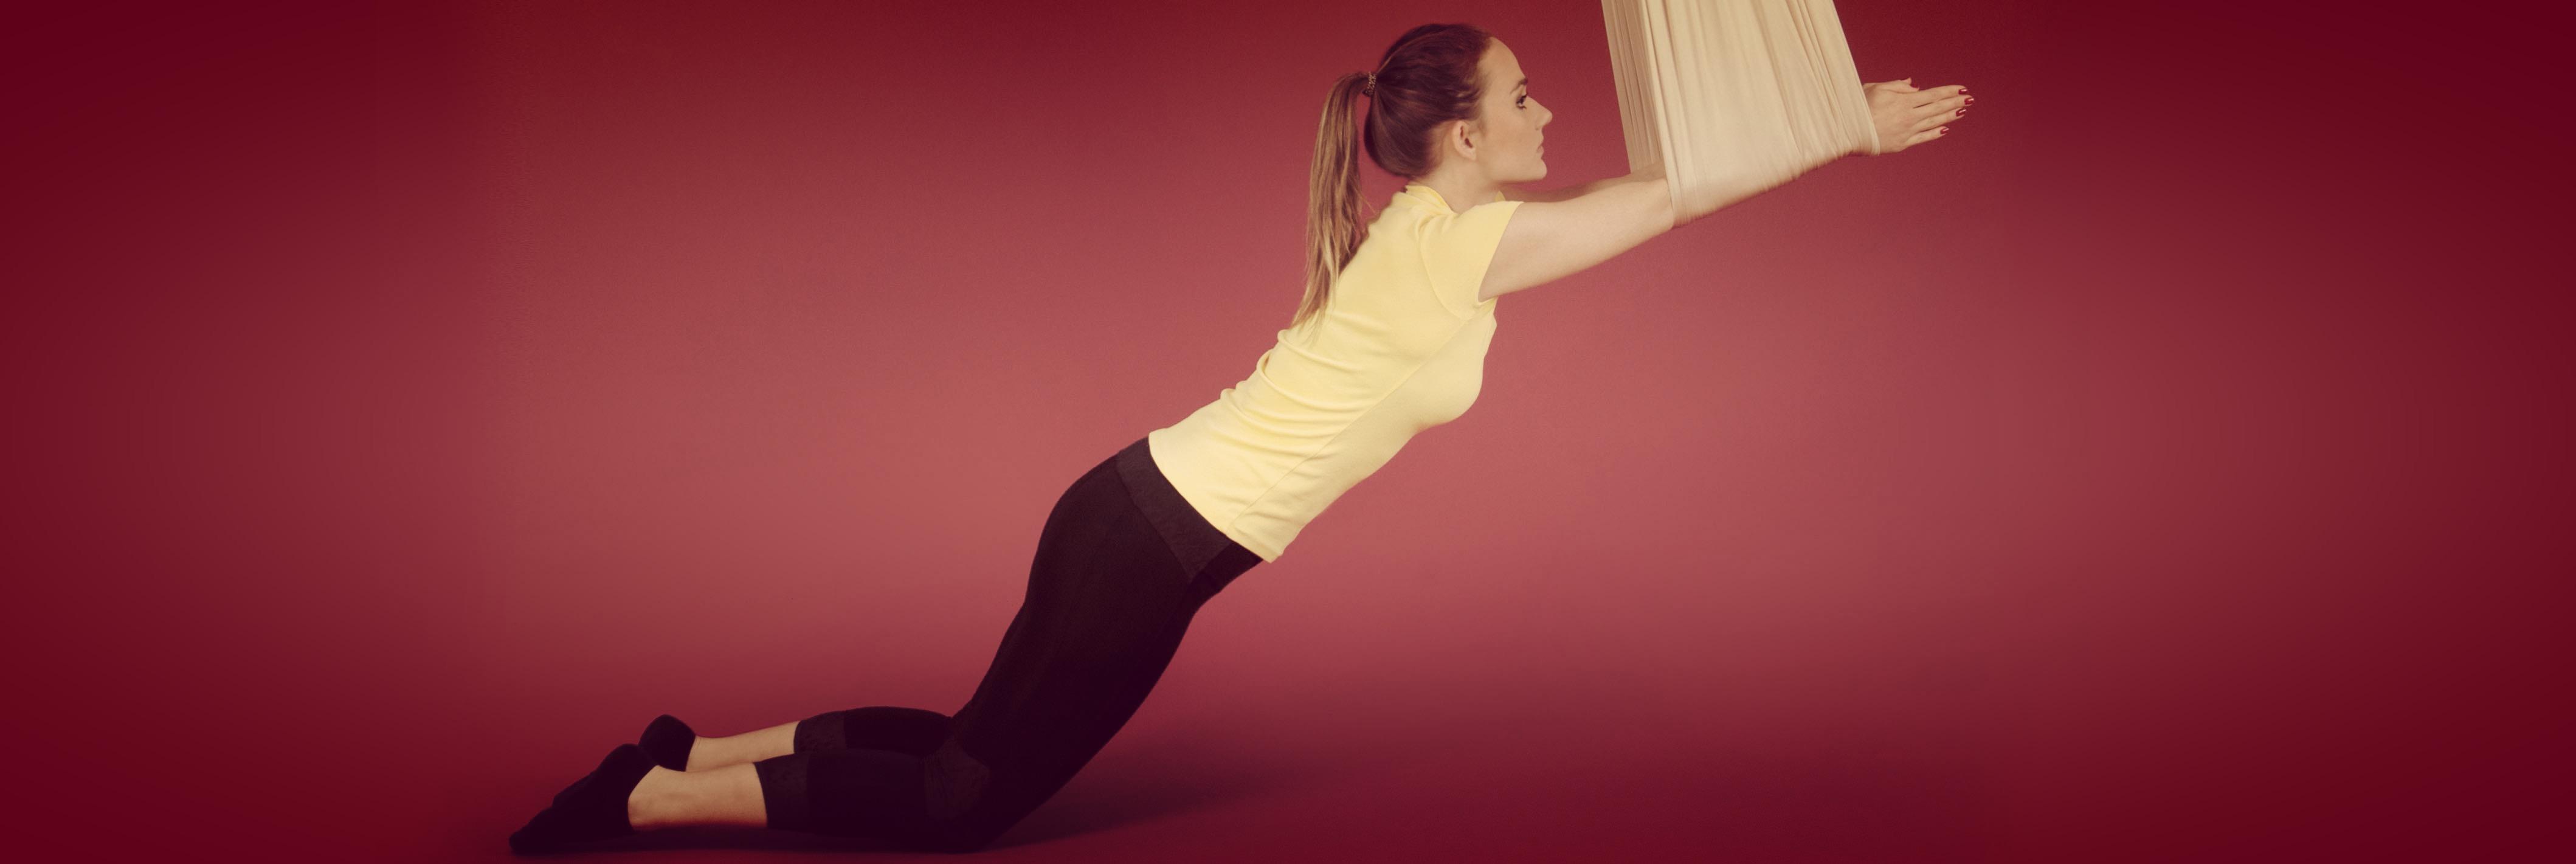 Studio-Elodie-Murnau-Aerial-Yoga-04